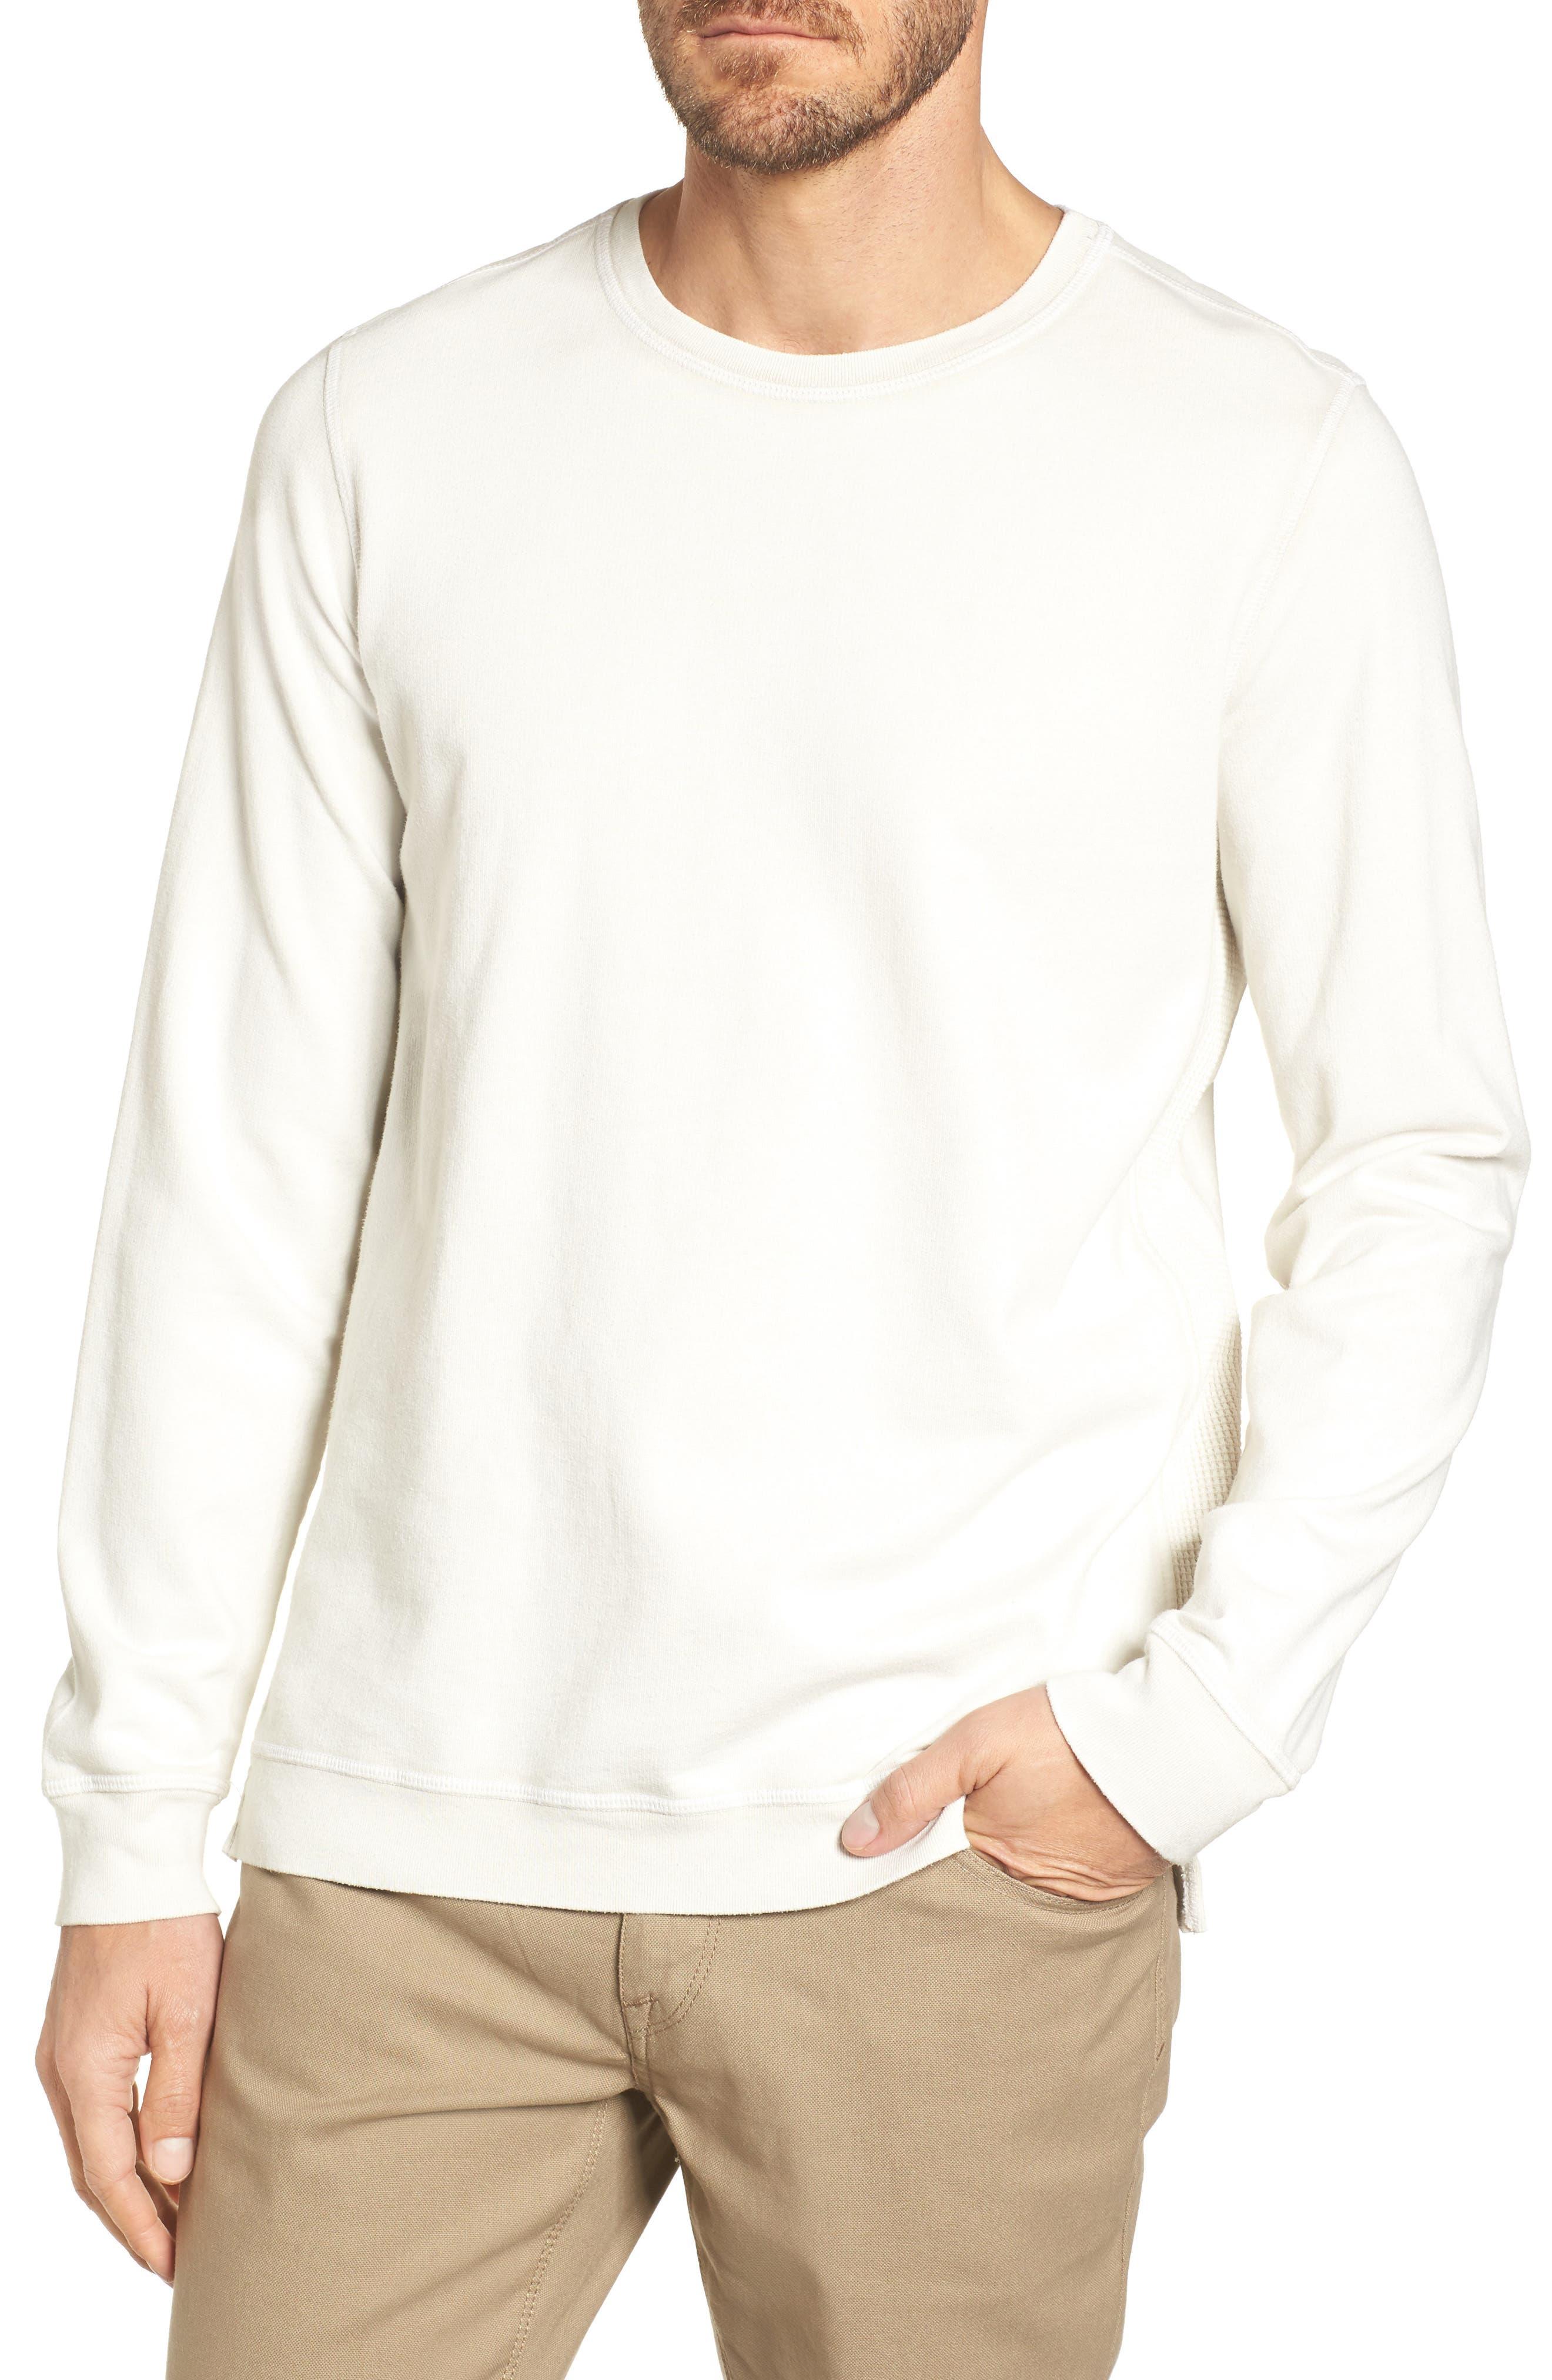 Main Image - AG Max Slim Long Sleeve T-Shirt